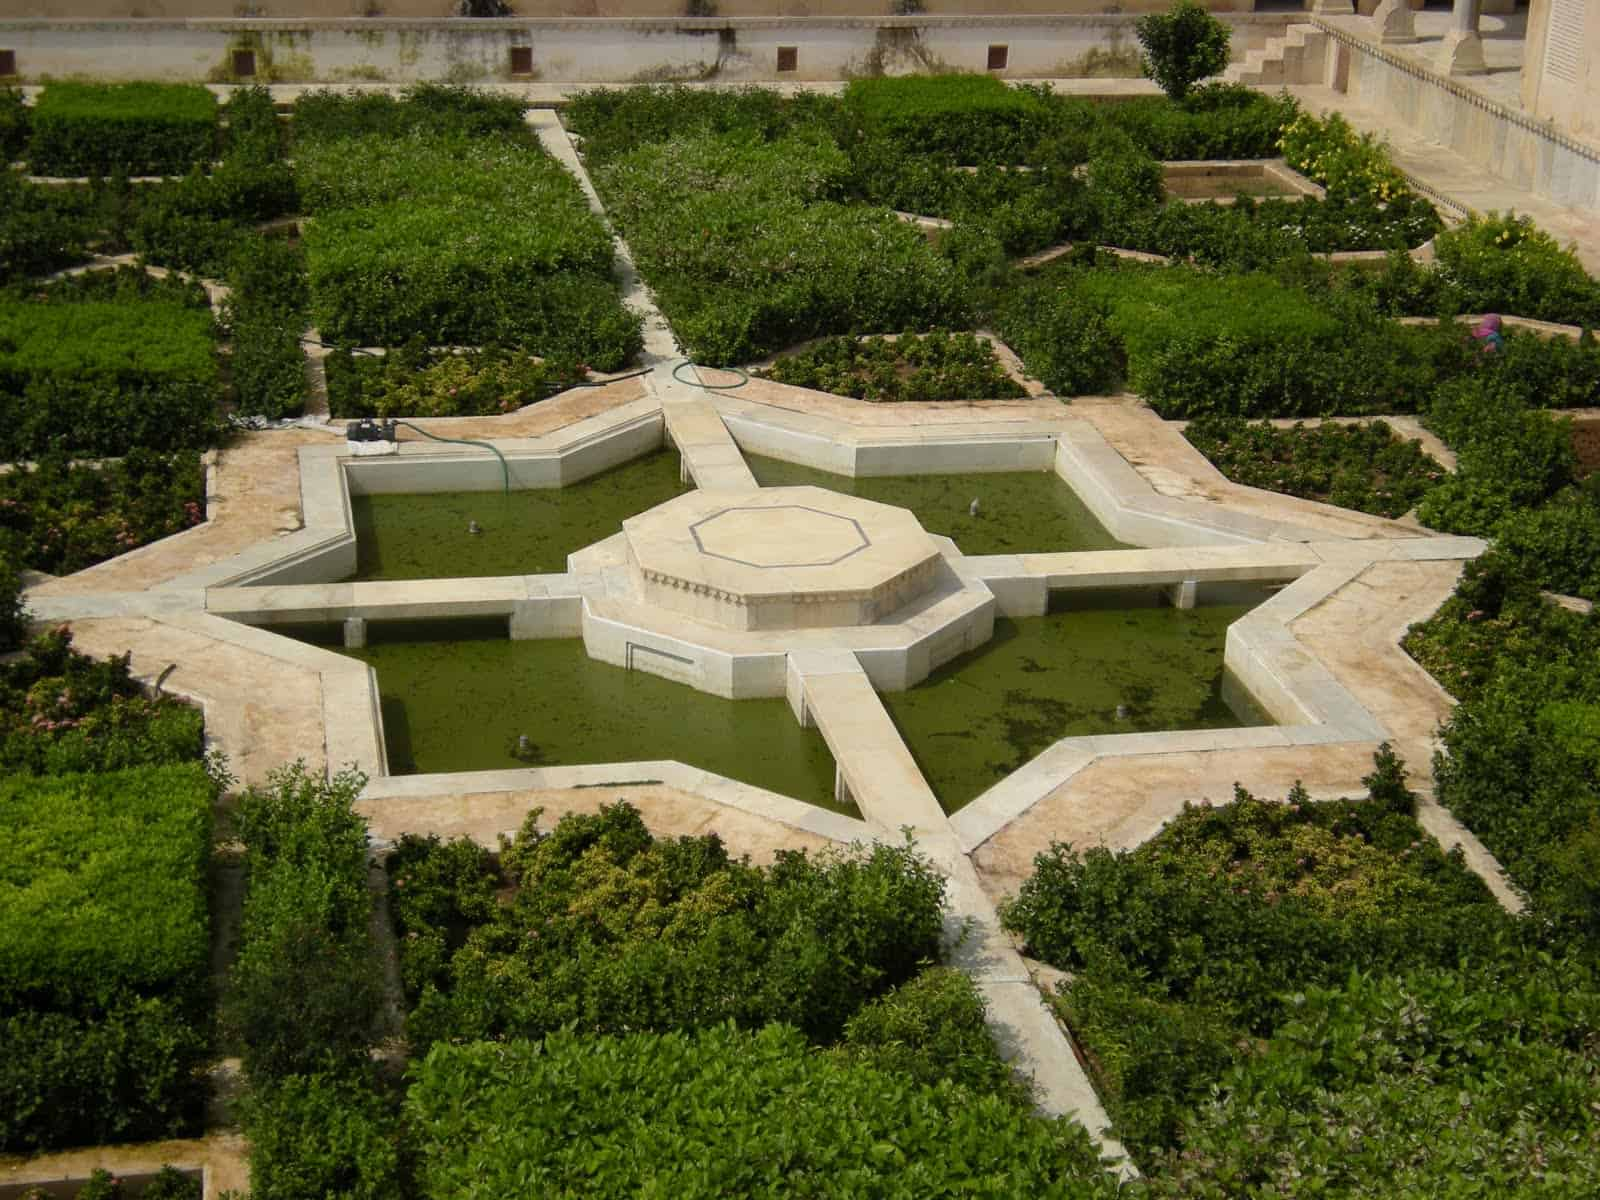 octagon - the garden of Taj Mahal